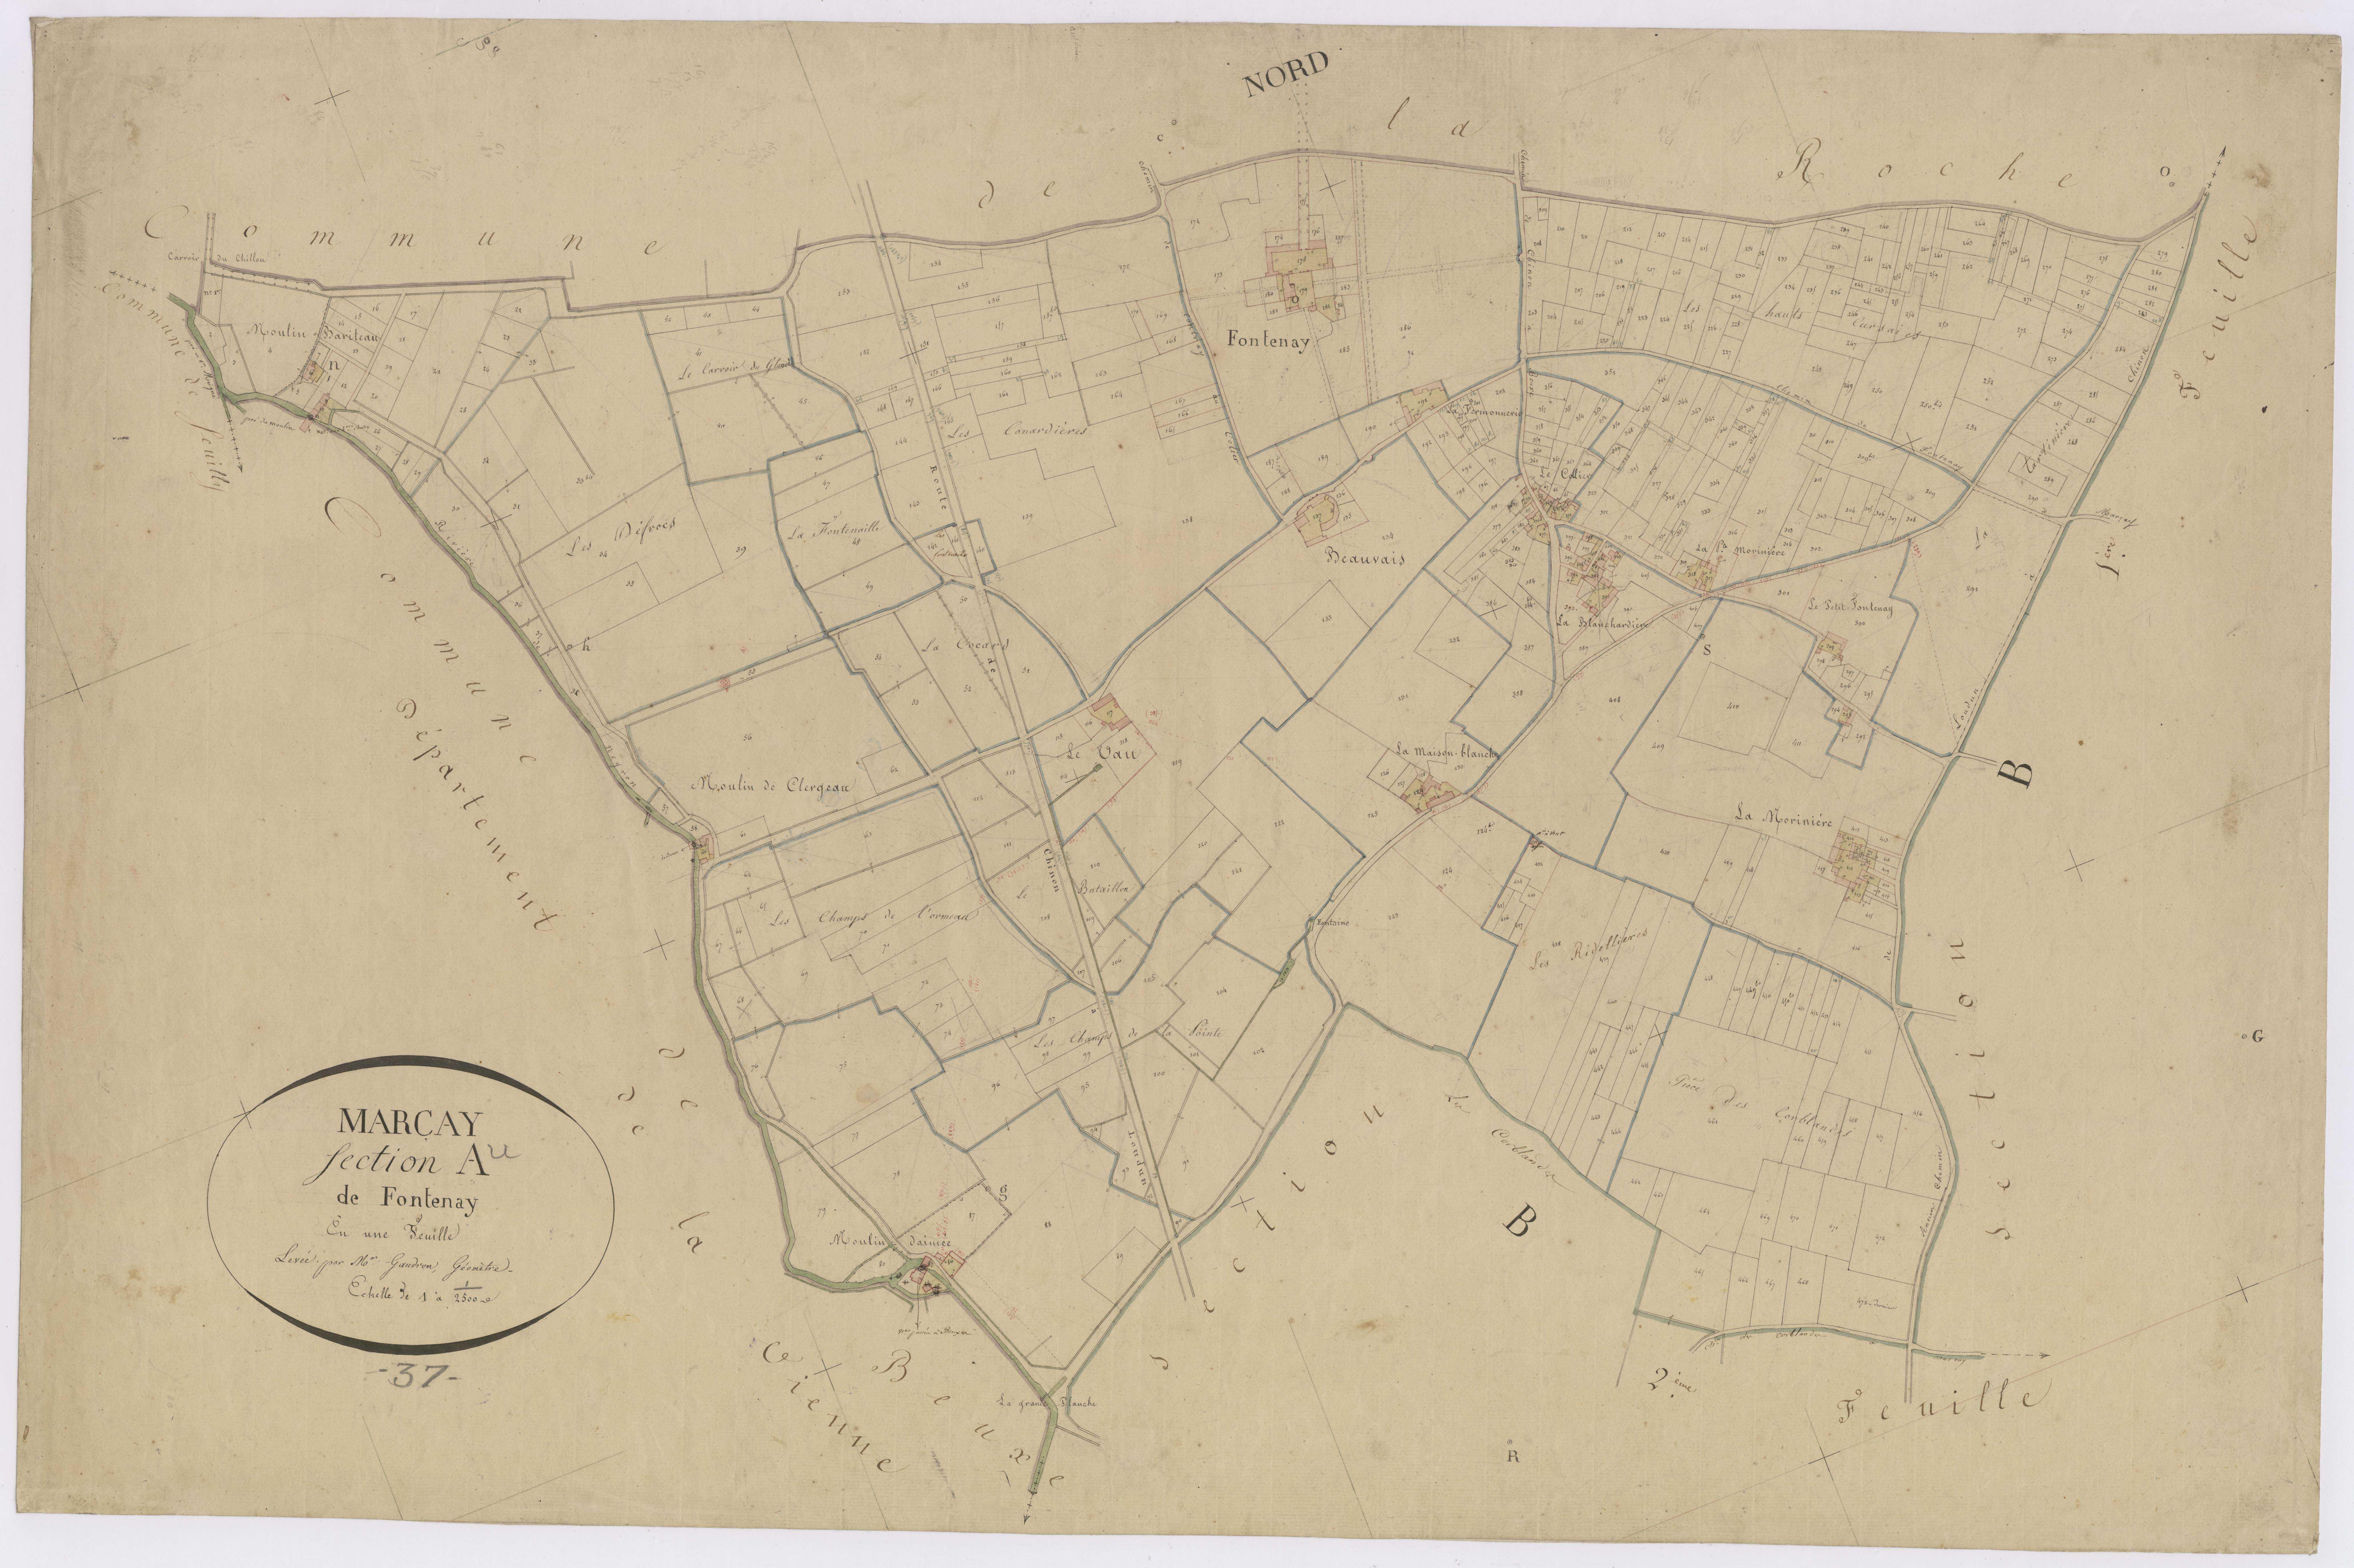 Section A1 de Fontenay